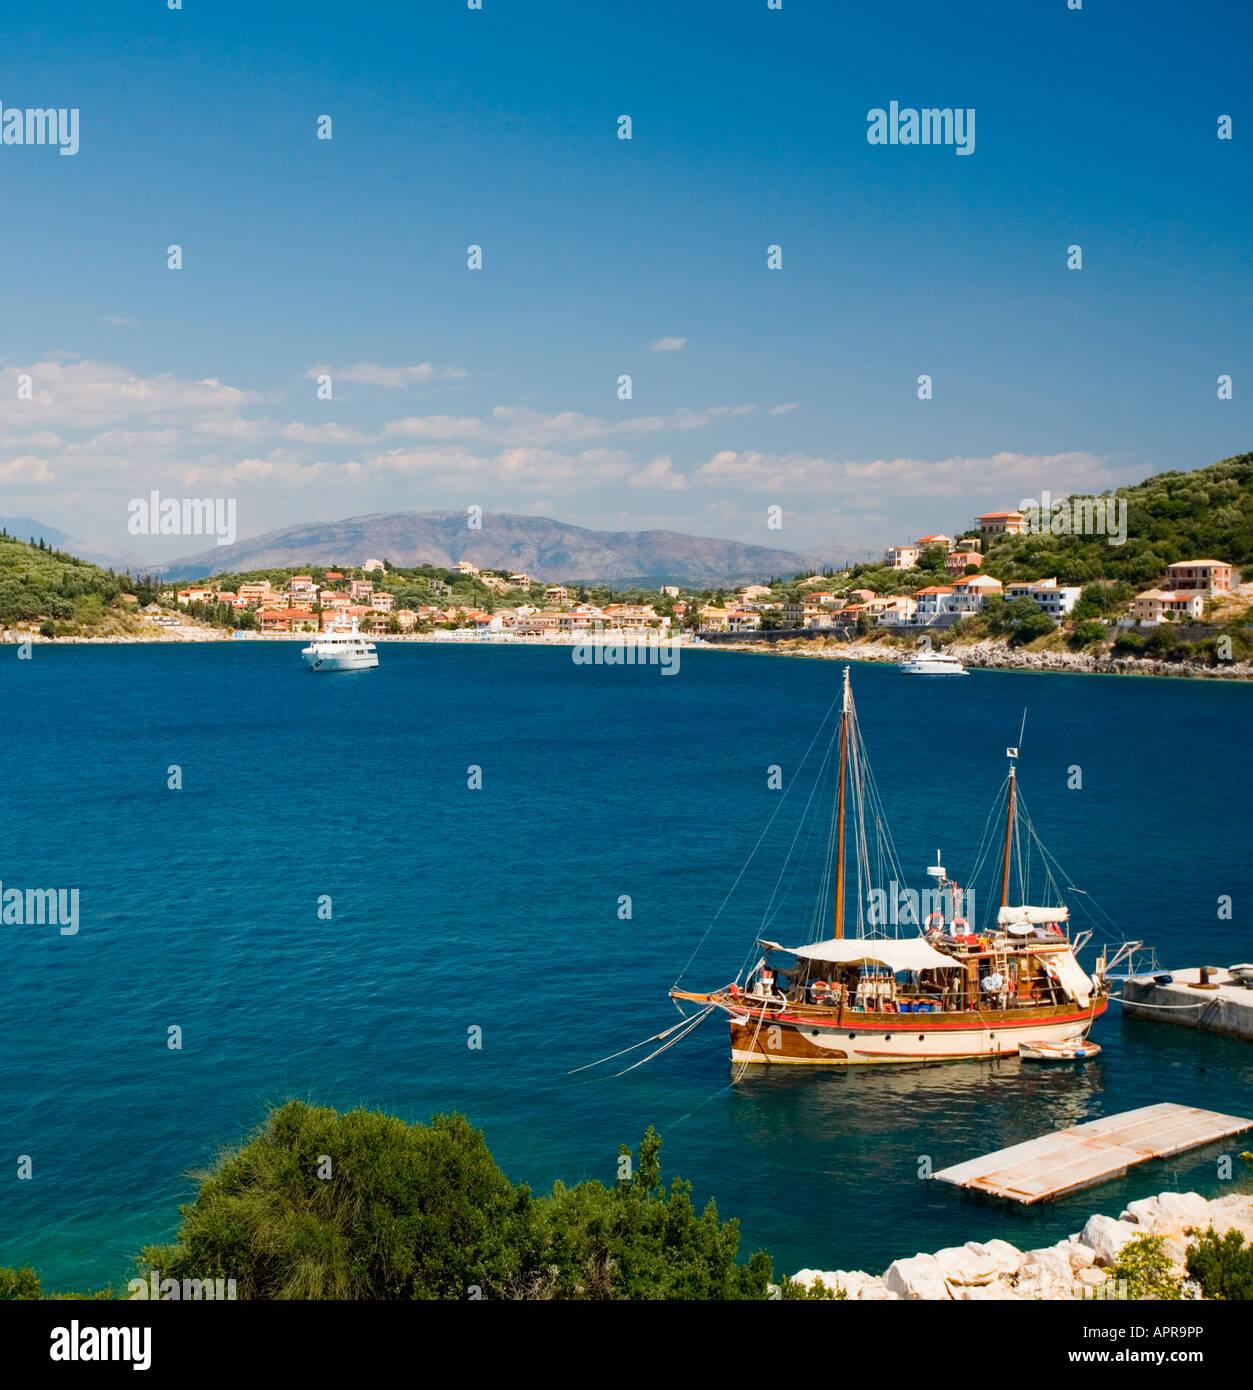 Kassiopi and boats, Corfu, Greece, Ionian Islands - Stock Image